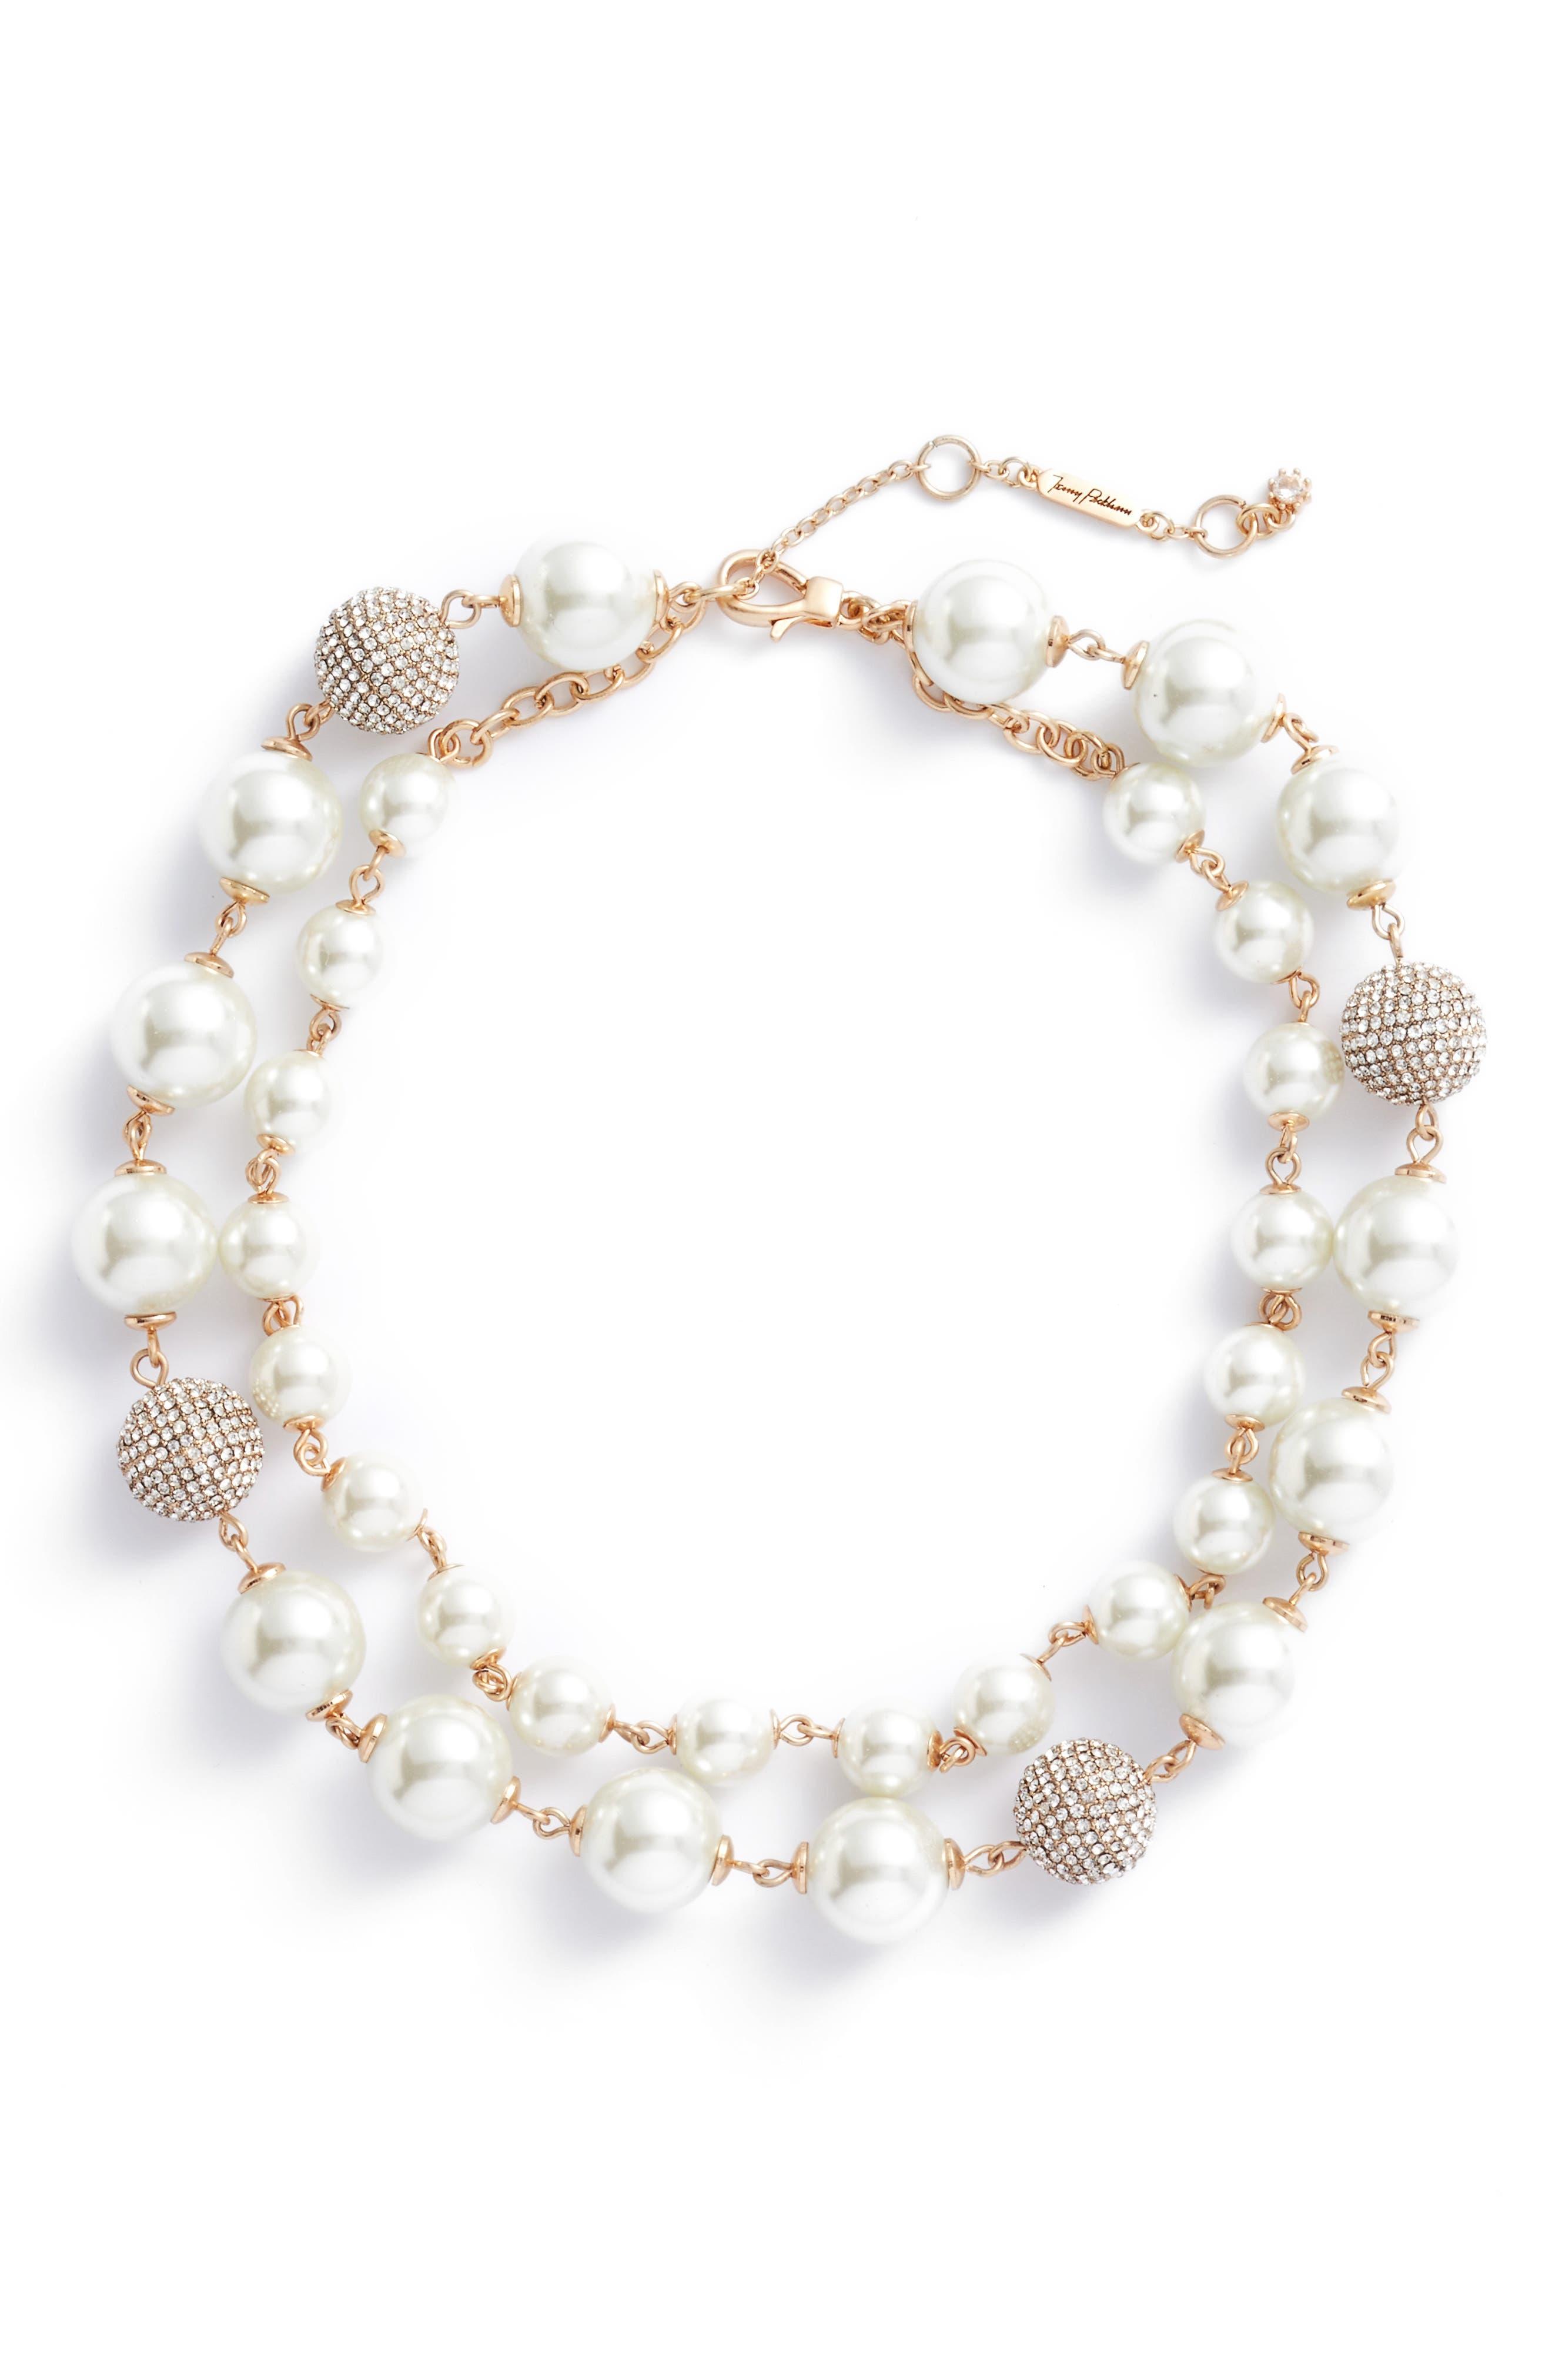 Multistrand Imitation Pearl Necklace,                             Main thumbnail 1, color,                             Gold/ Pearl/ Crystal